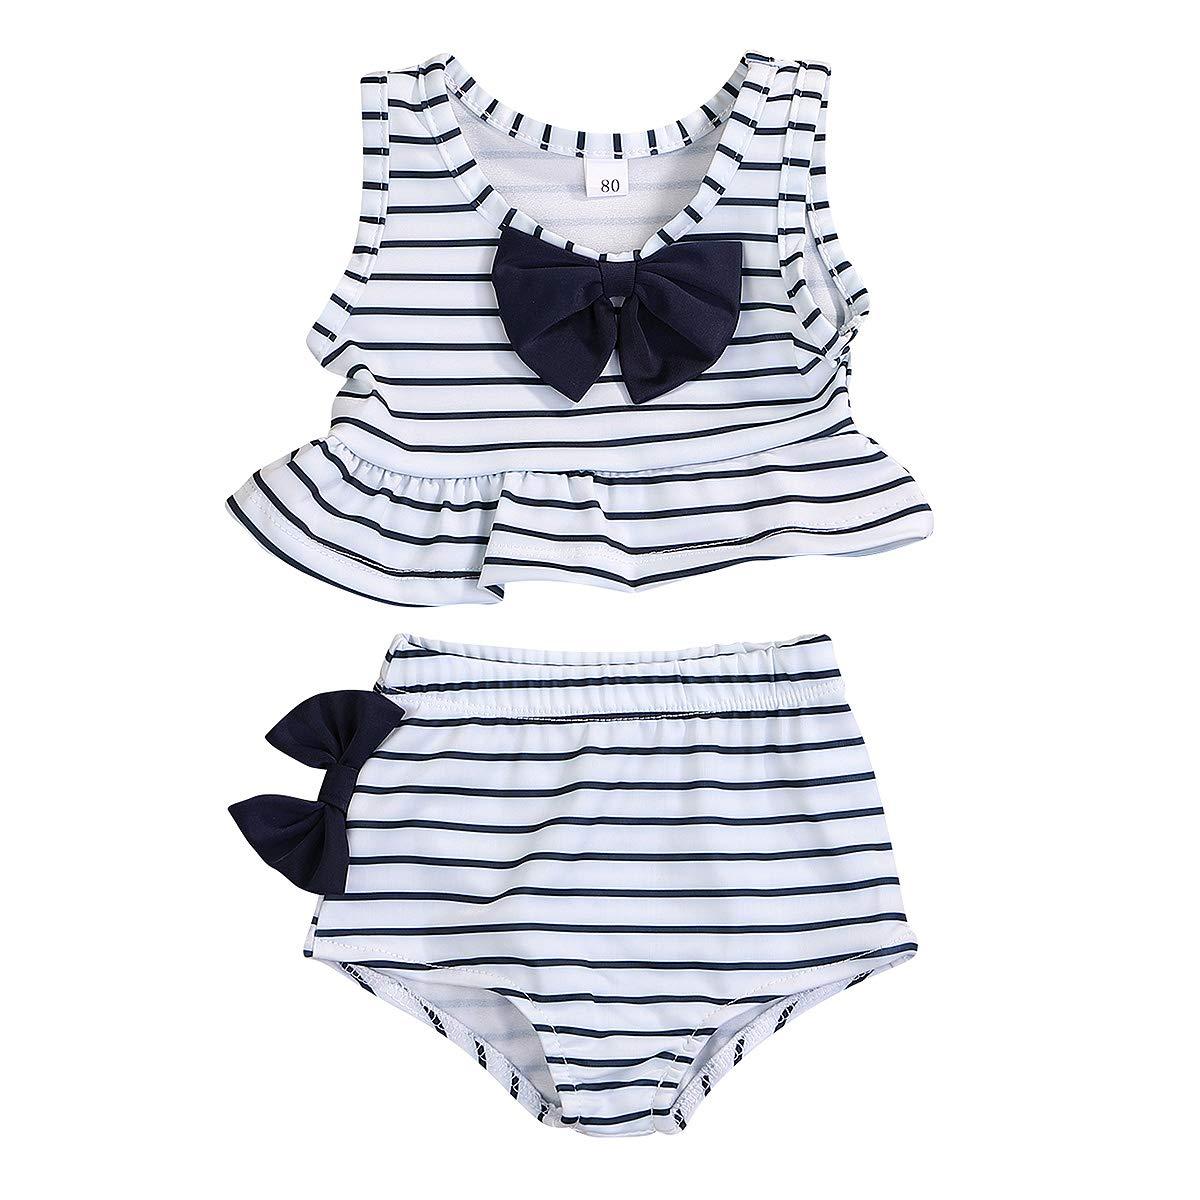 Shorts 2pcs Baby Bathing Suit Swimwear Bikini Set Toddler Baby Girl Swimsuit Ruffle Striped Bowknot Top